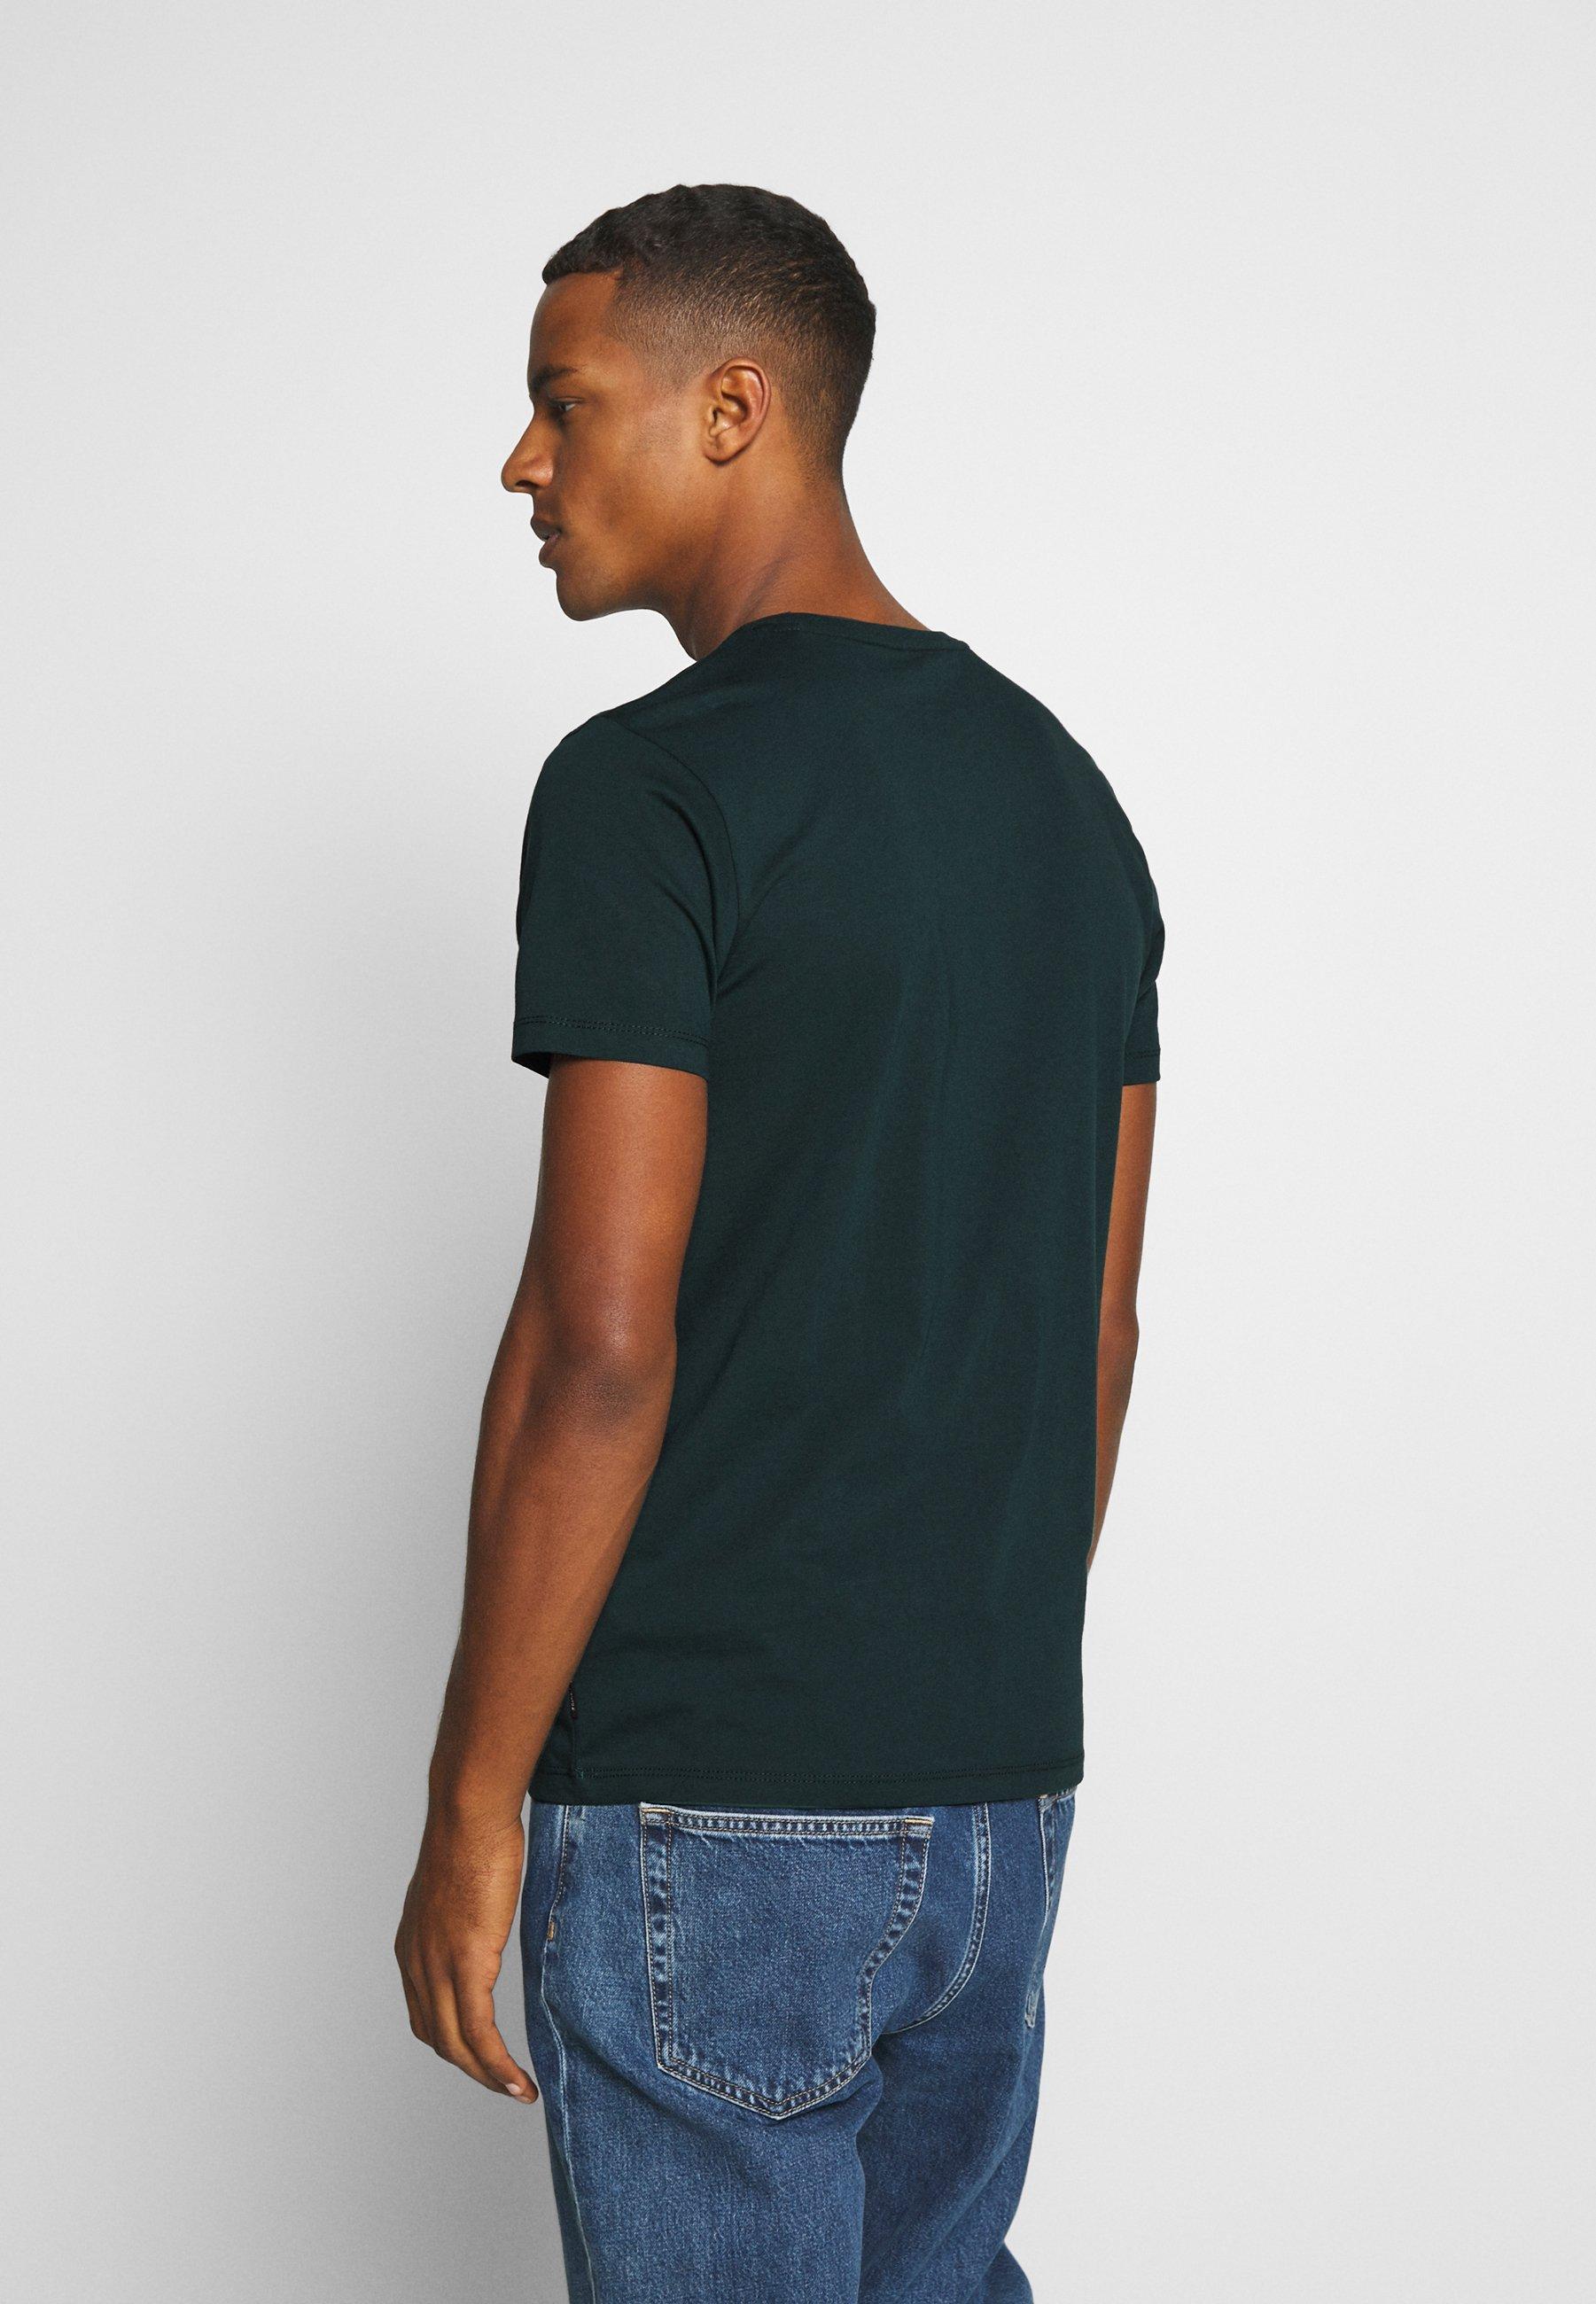 Esprit Print T-shirt - dark green IlSXv